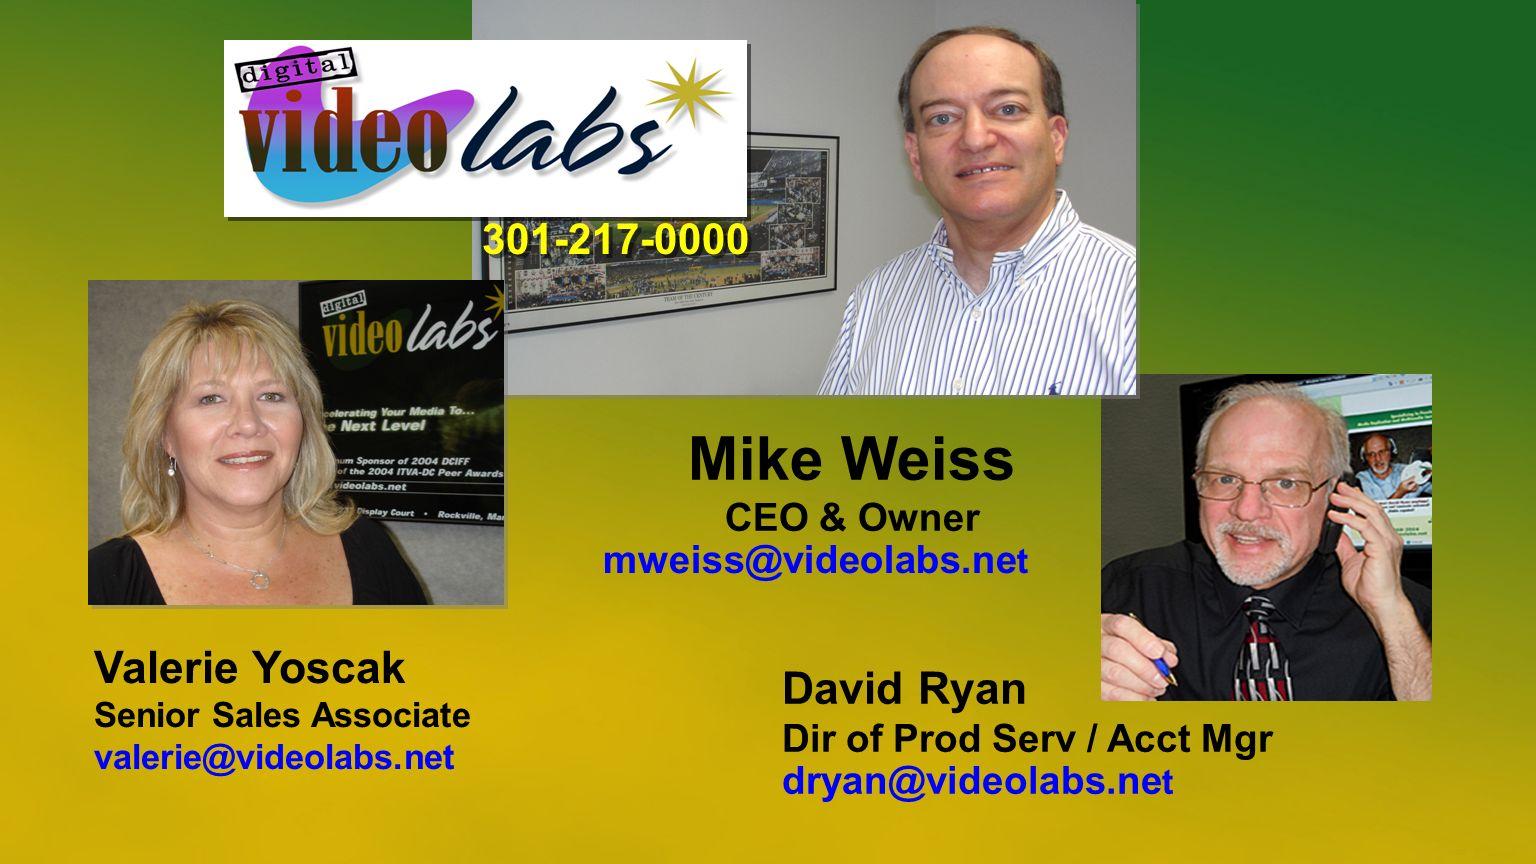 David Ryan Dir of Prod Serv / Acct Mgr dryan@videolabs.ne t Mike Weiss CEO & Owner mweiss@videolabs.ne t Valerie Yoscak Senior Sales Associate valerie@videolabs.net 301-217-0000